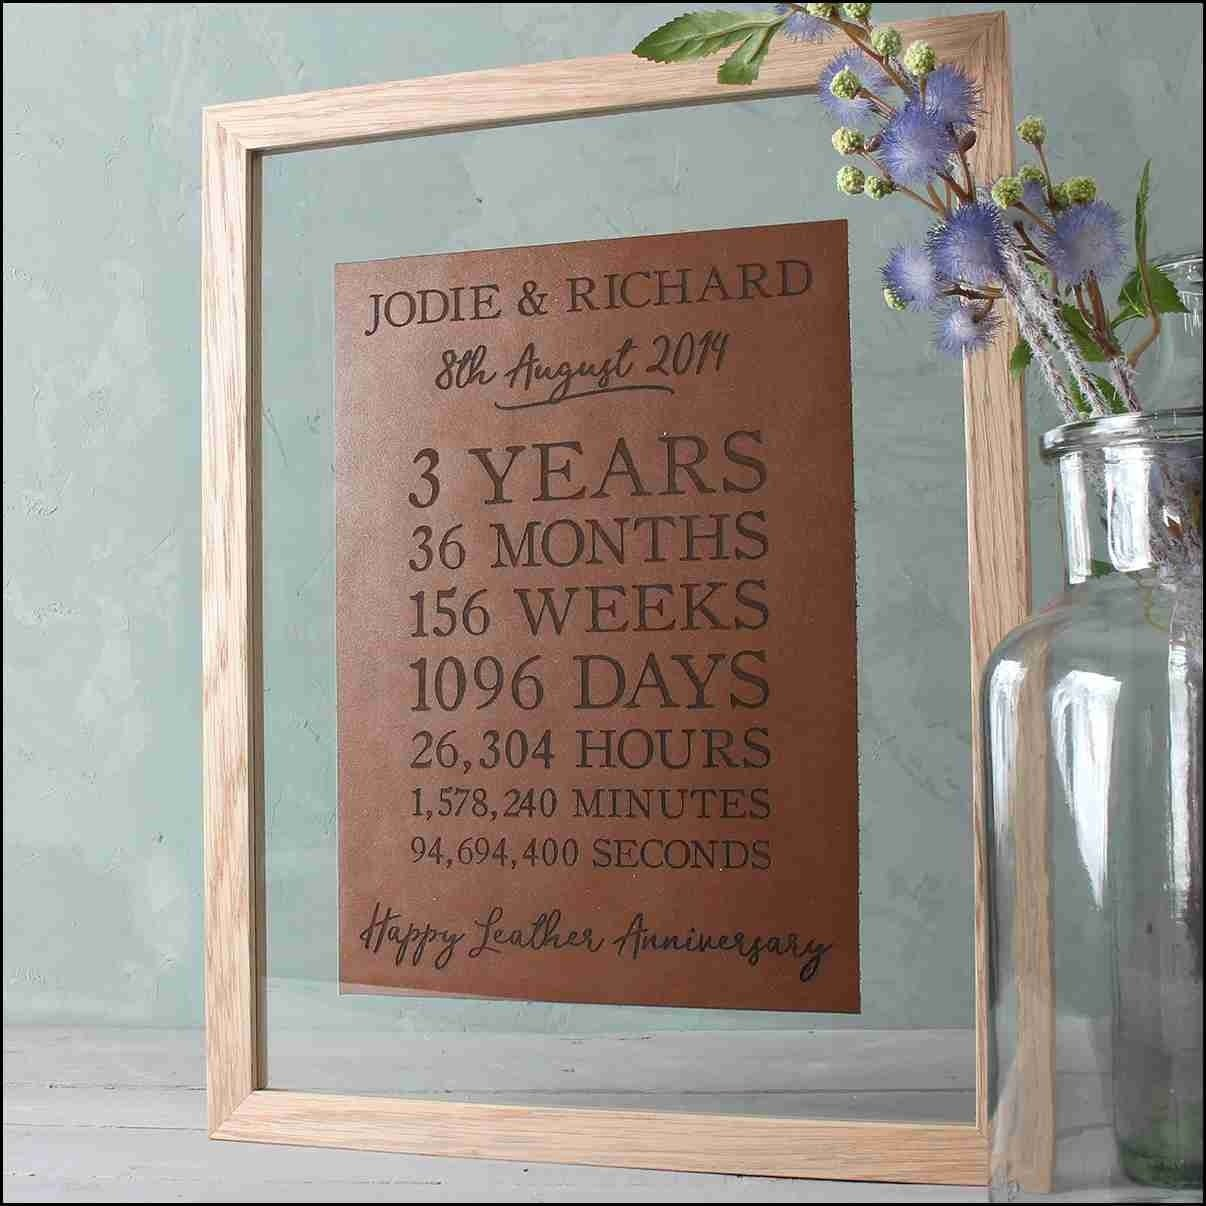 10 Elegant Third Wedding Anniversary Gift Ideas third wedding anniversary gift ideas evgplc